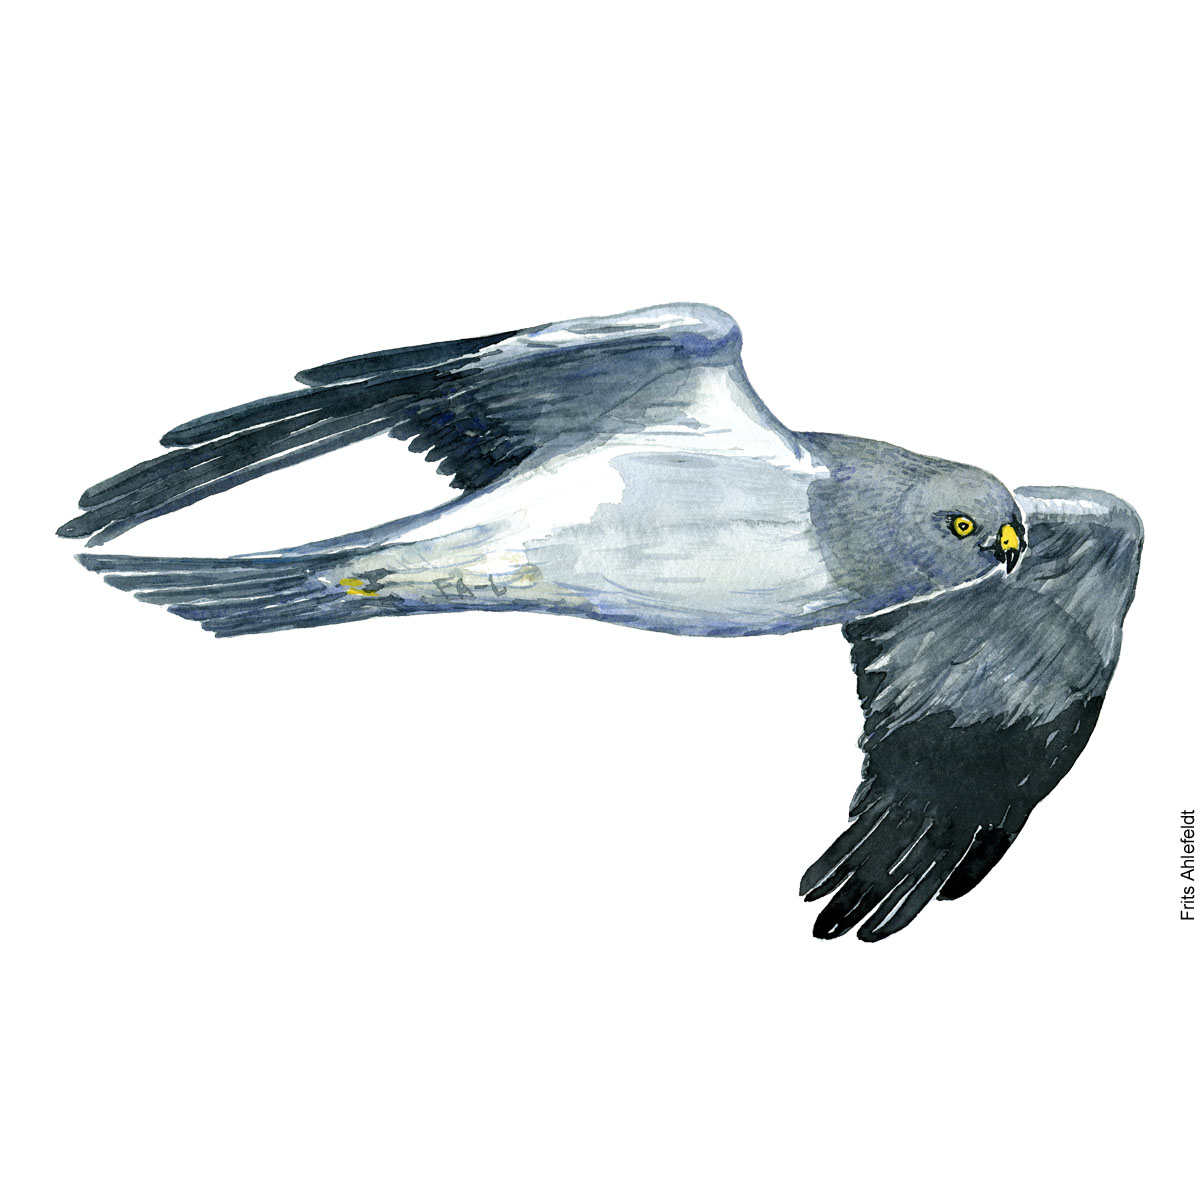 Kaerhoeg - Henharrier bird watercolor painting. Artwork by Frits Ahlefeldt. Fugle akvarel